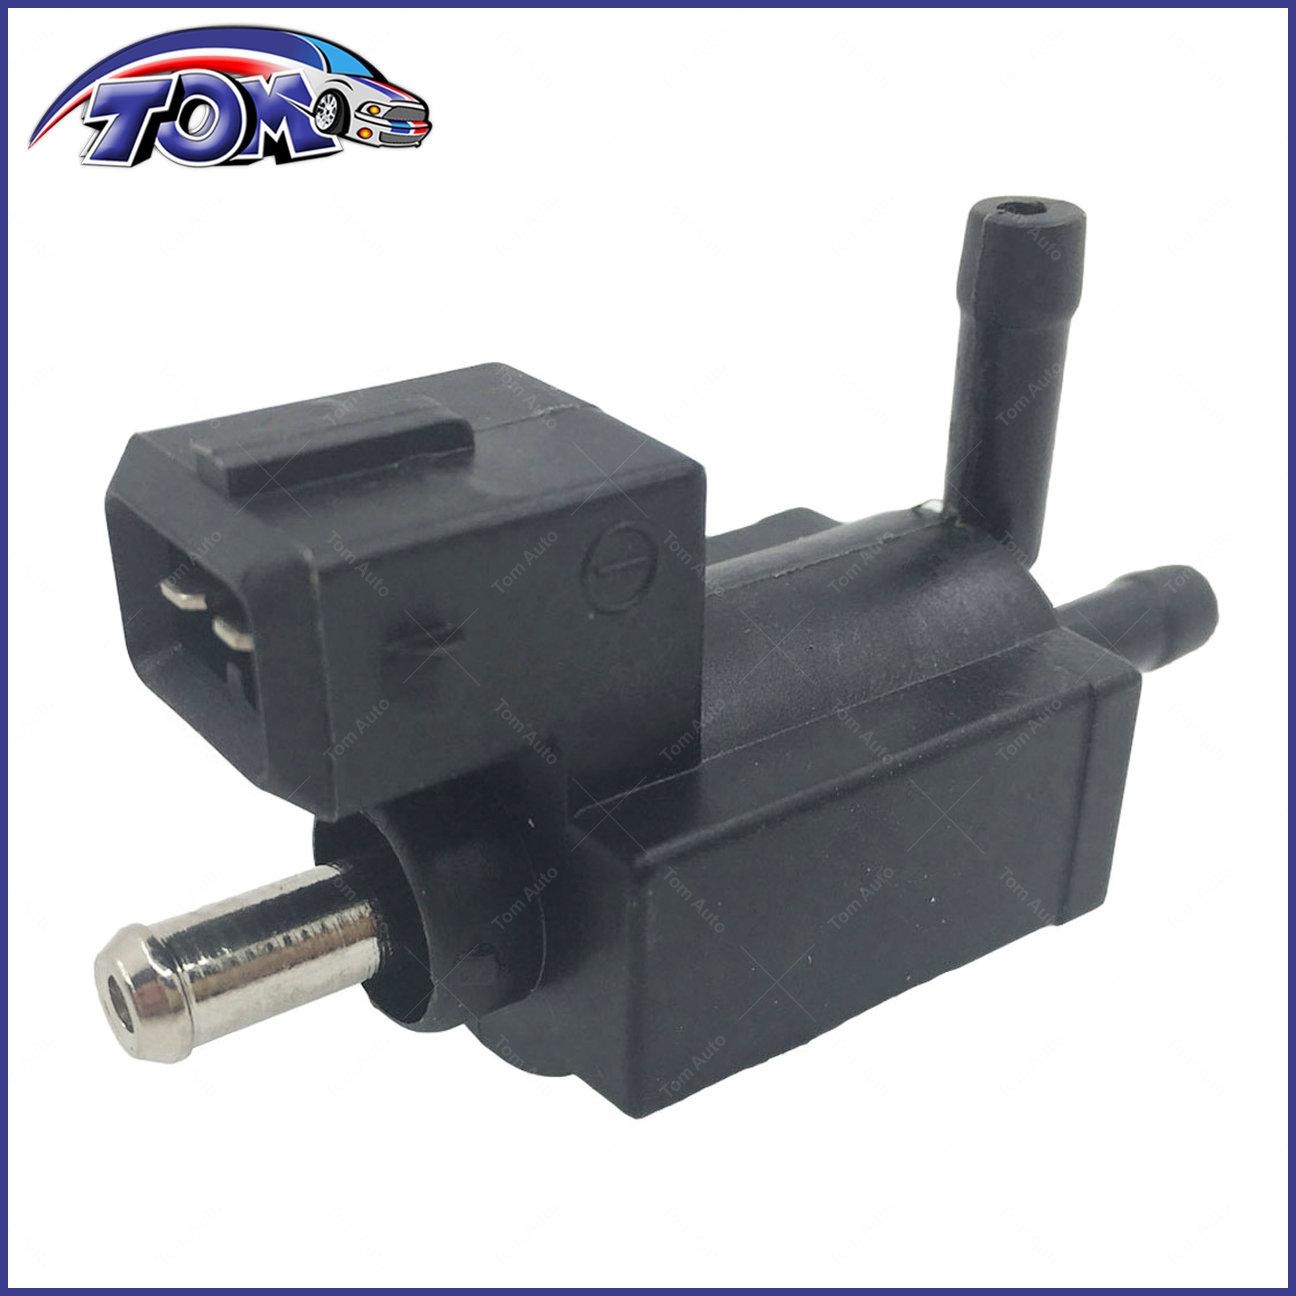 FLYPIG Engine Oil Level Sender Sensor for Audi A4 A6 A8 Allroad TT S4 Volkswagen Jetta 1J0907660B